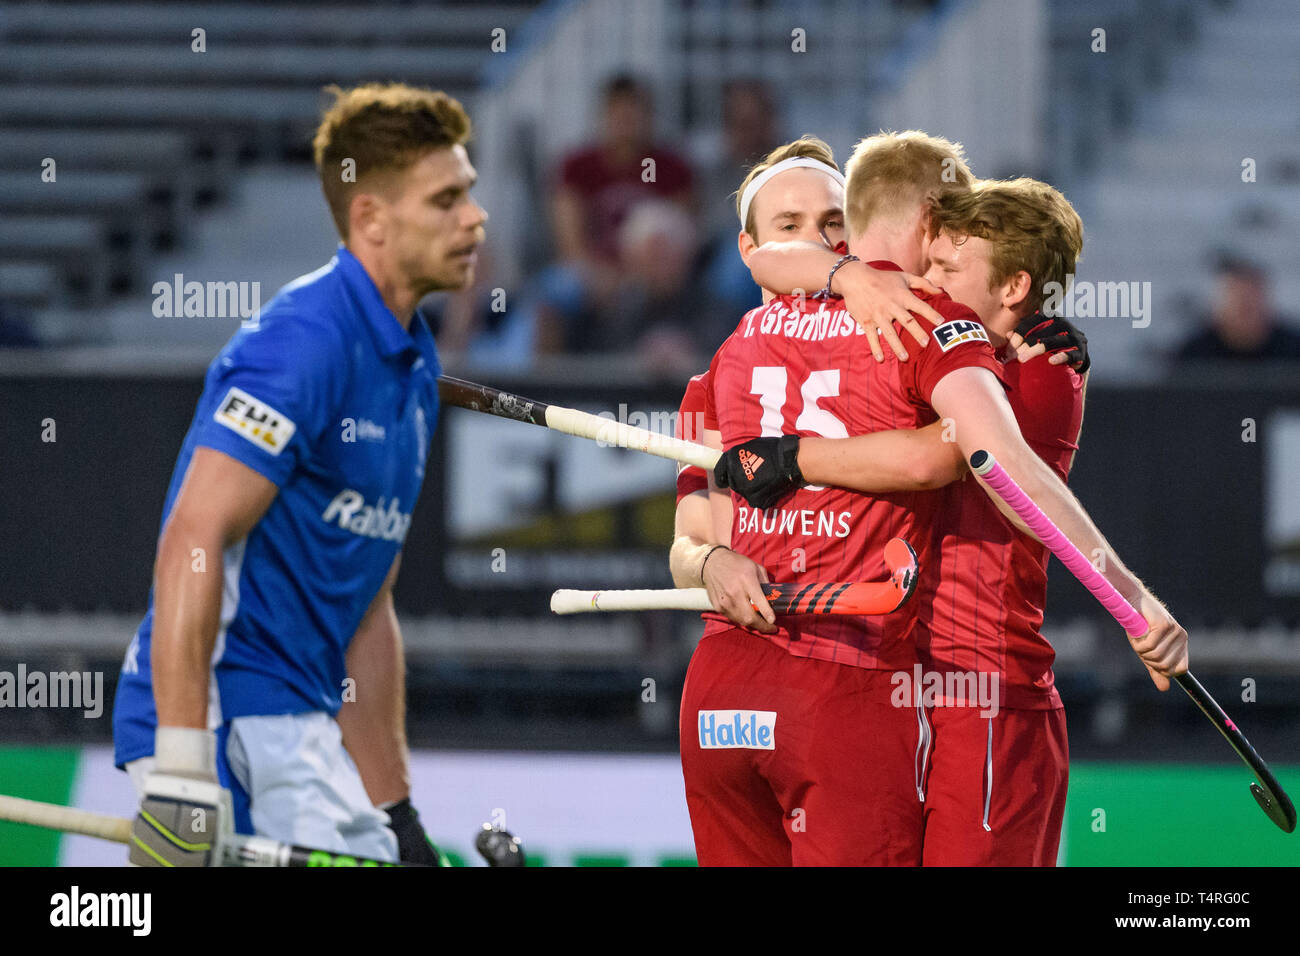 Eindhoven 18 04 2019 Euro Hockey League 2019 Venue Hc Oranje